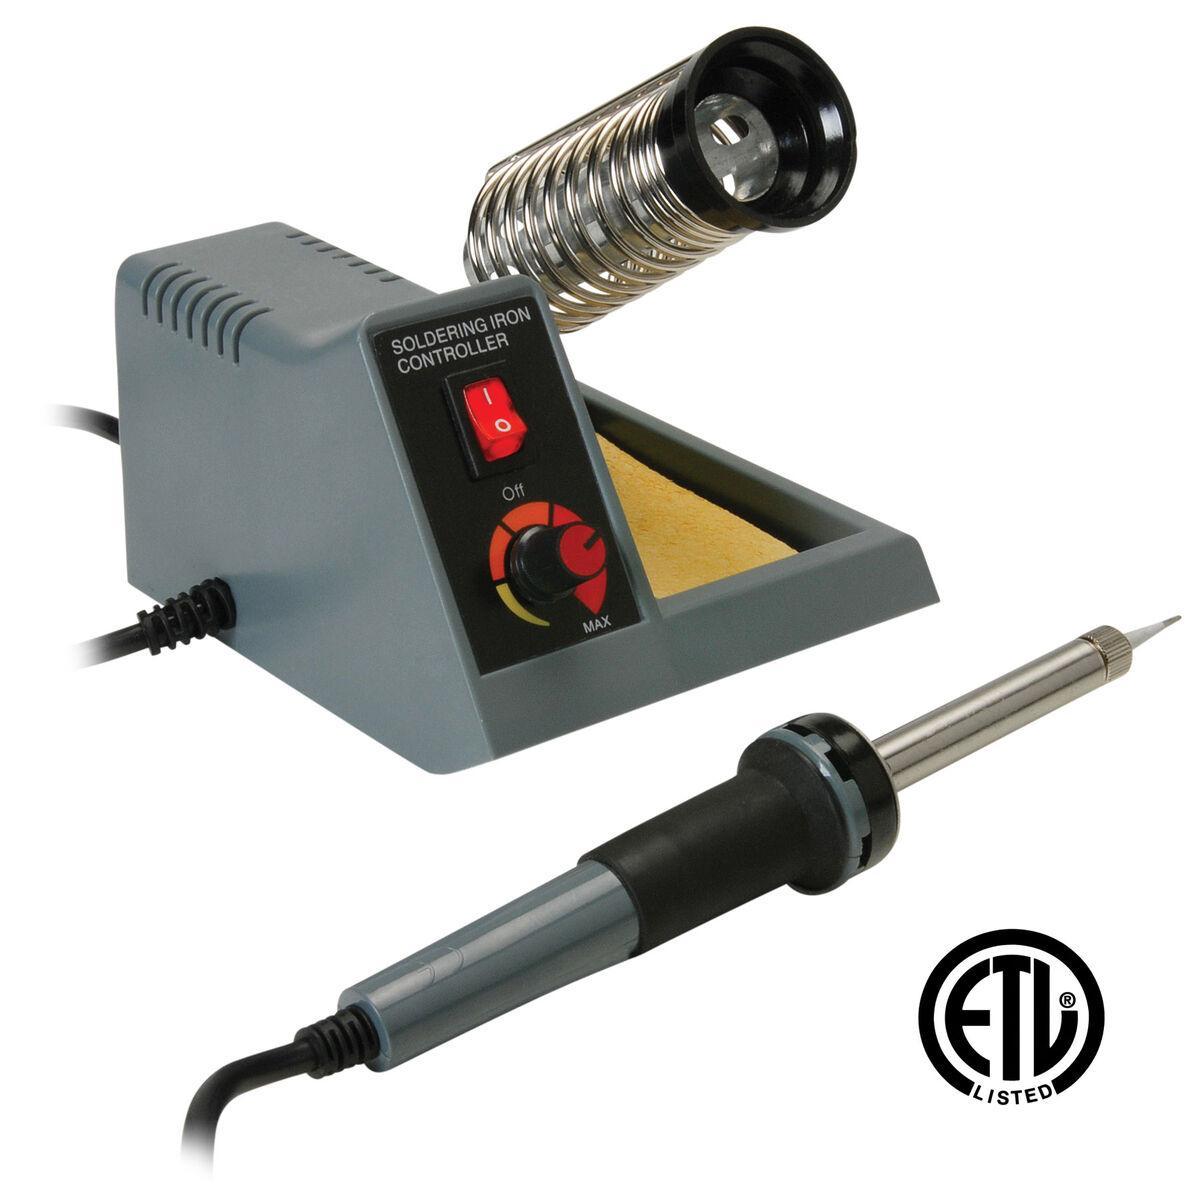 5 lot Portable Manual Desoldering Pump Suction Tin Gun Solder Sucker Tip